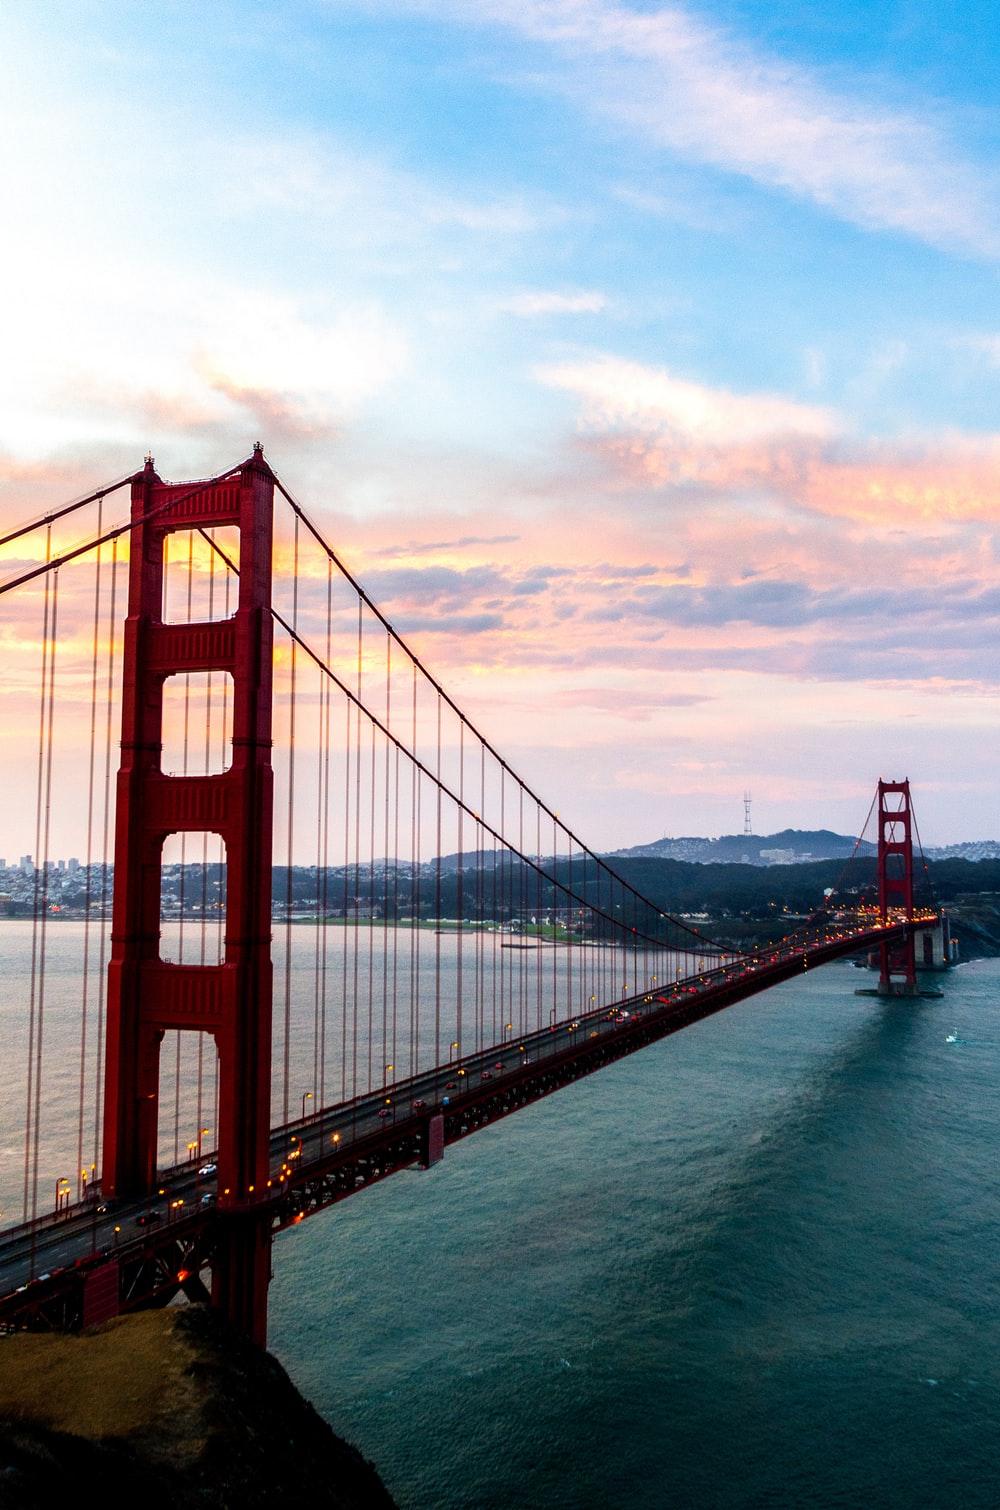 500 Golden Gate Bridge Pictures Download Images on Unsplash 1000x1510